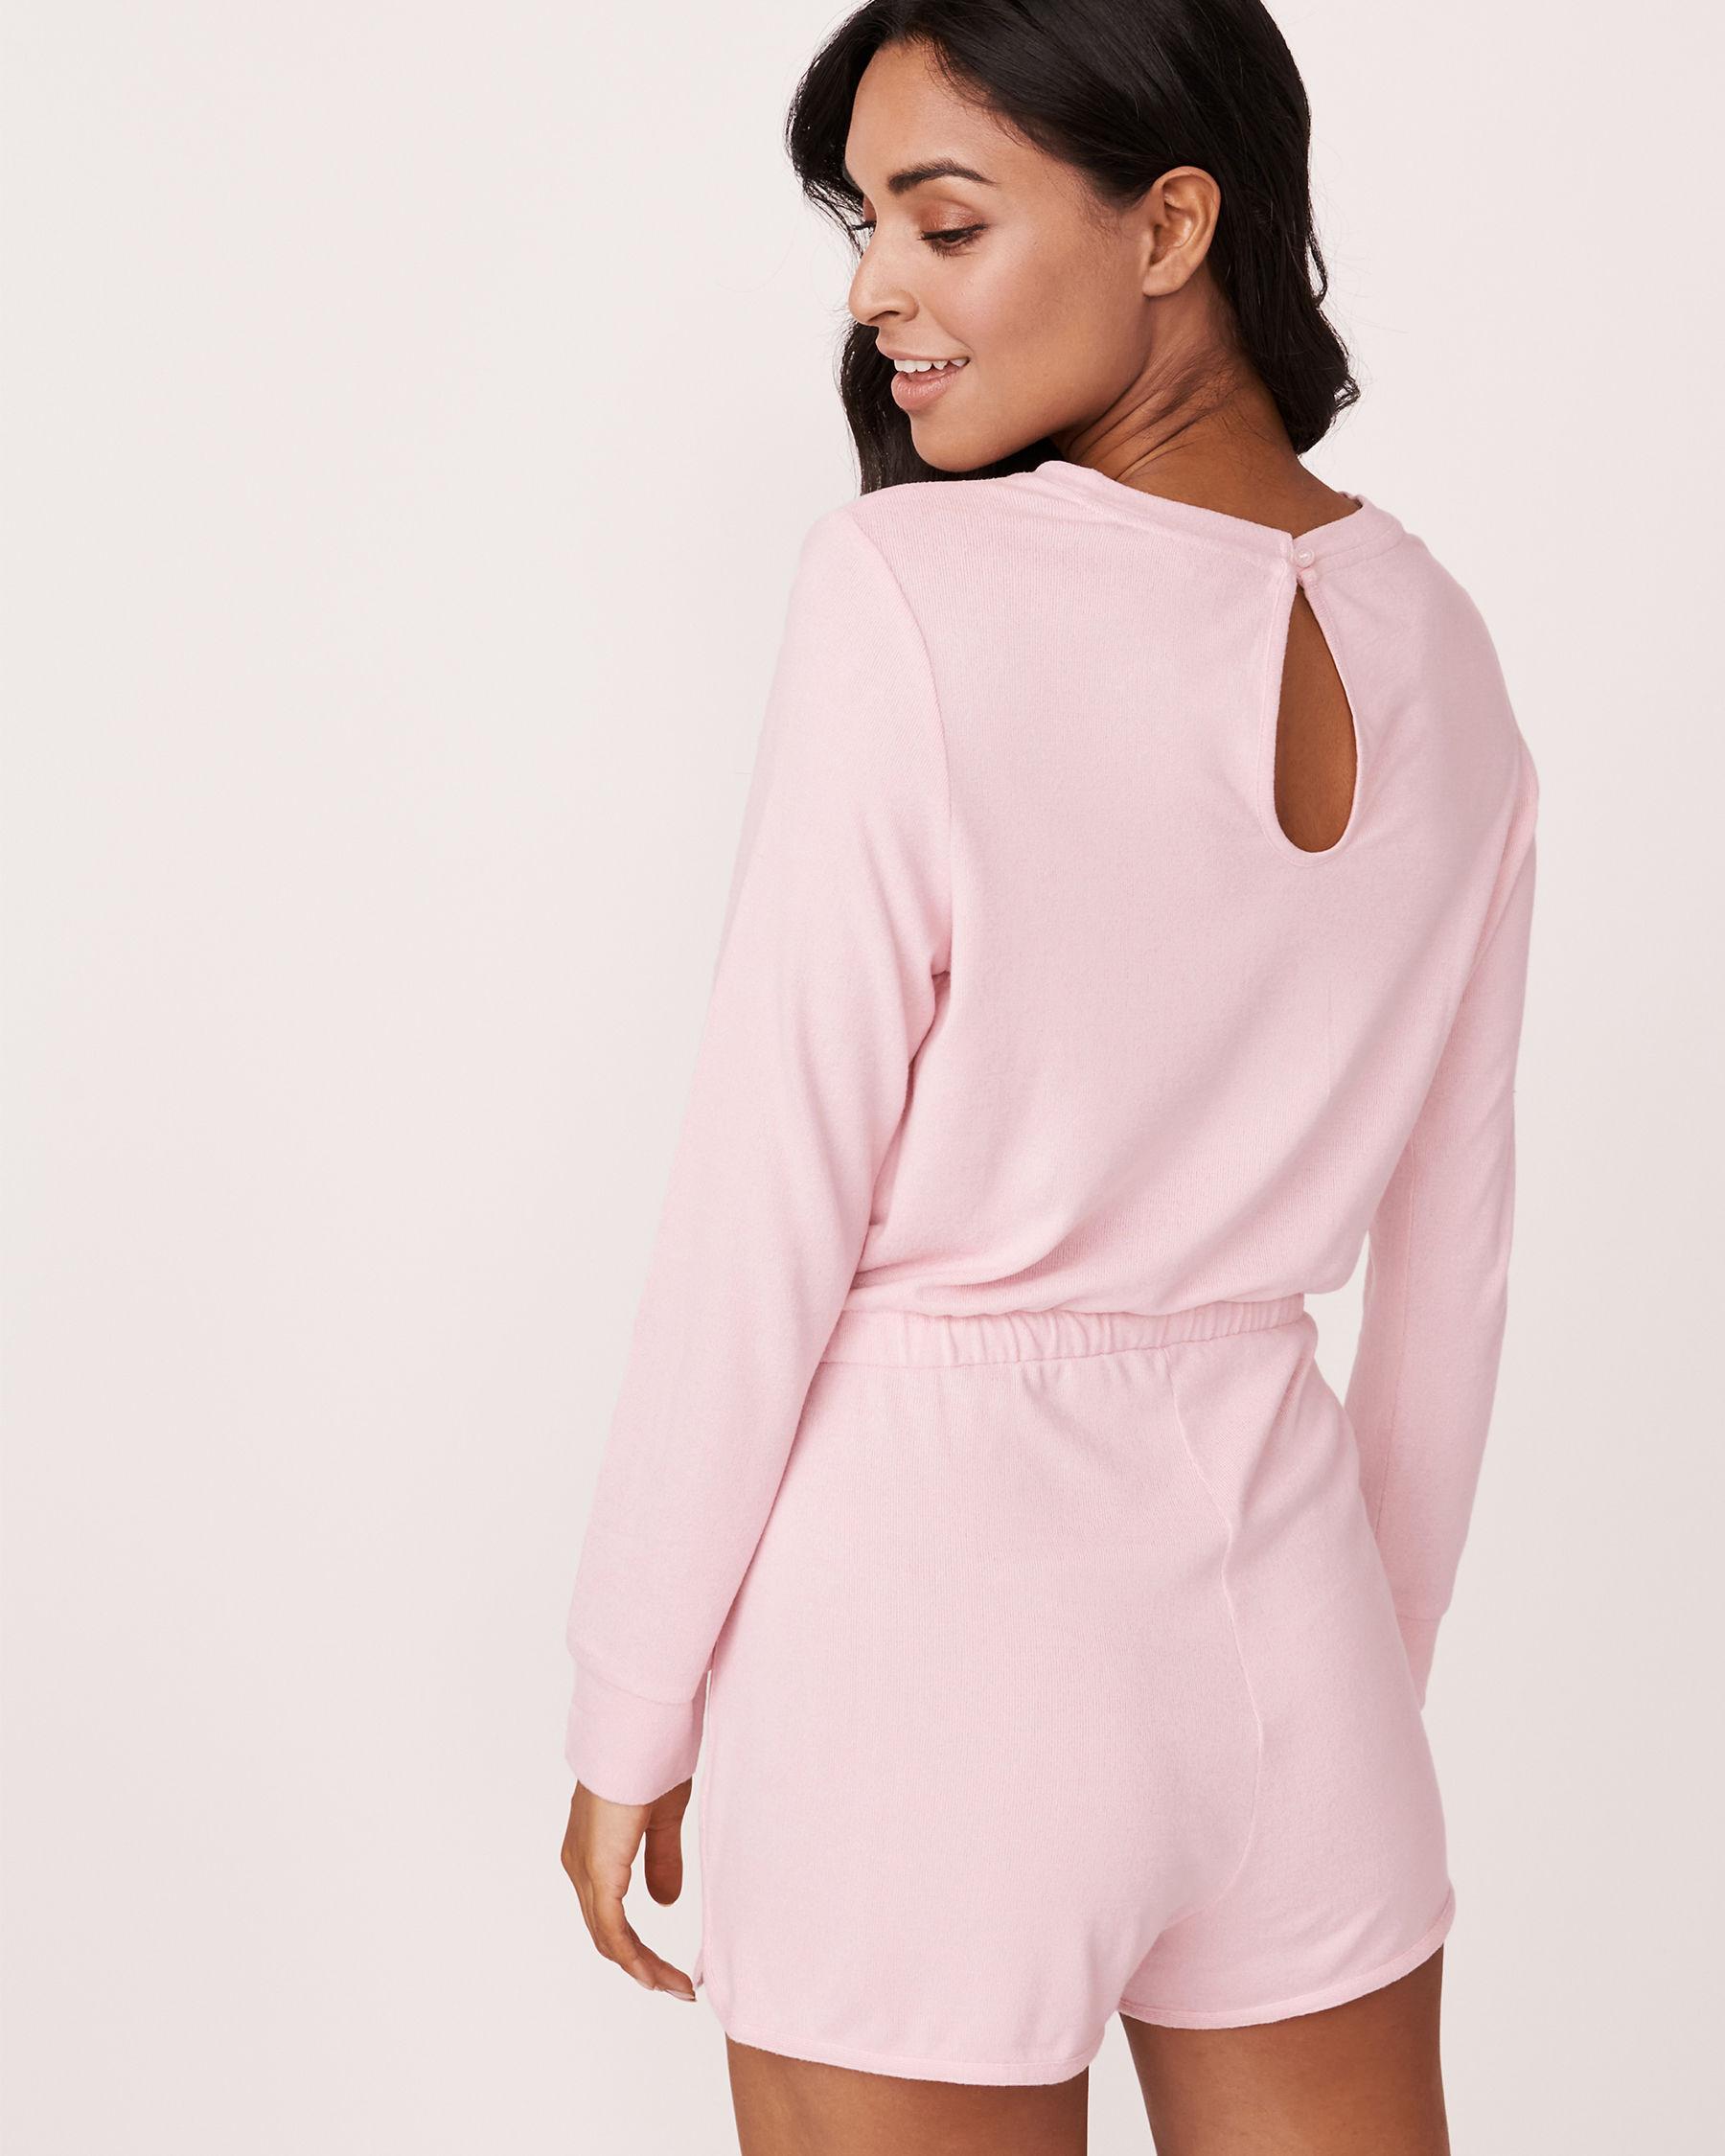 LA VIE EN ROSE Soft Knit Long Sleeves Romper Mix pink 775-312-0-11 - View2